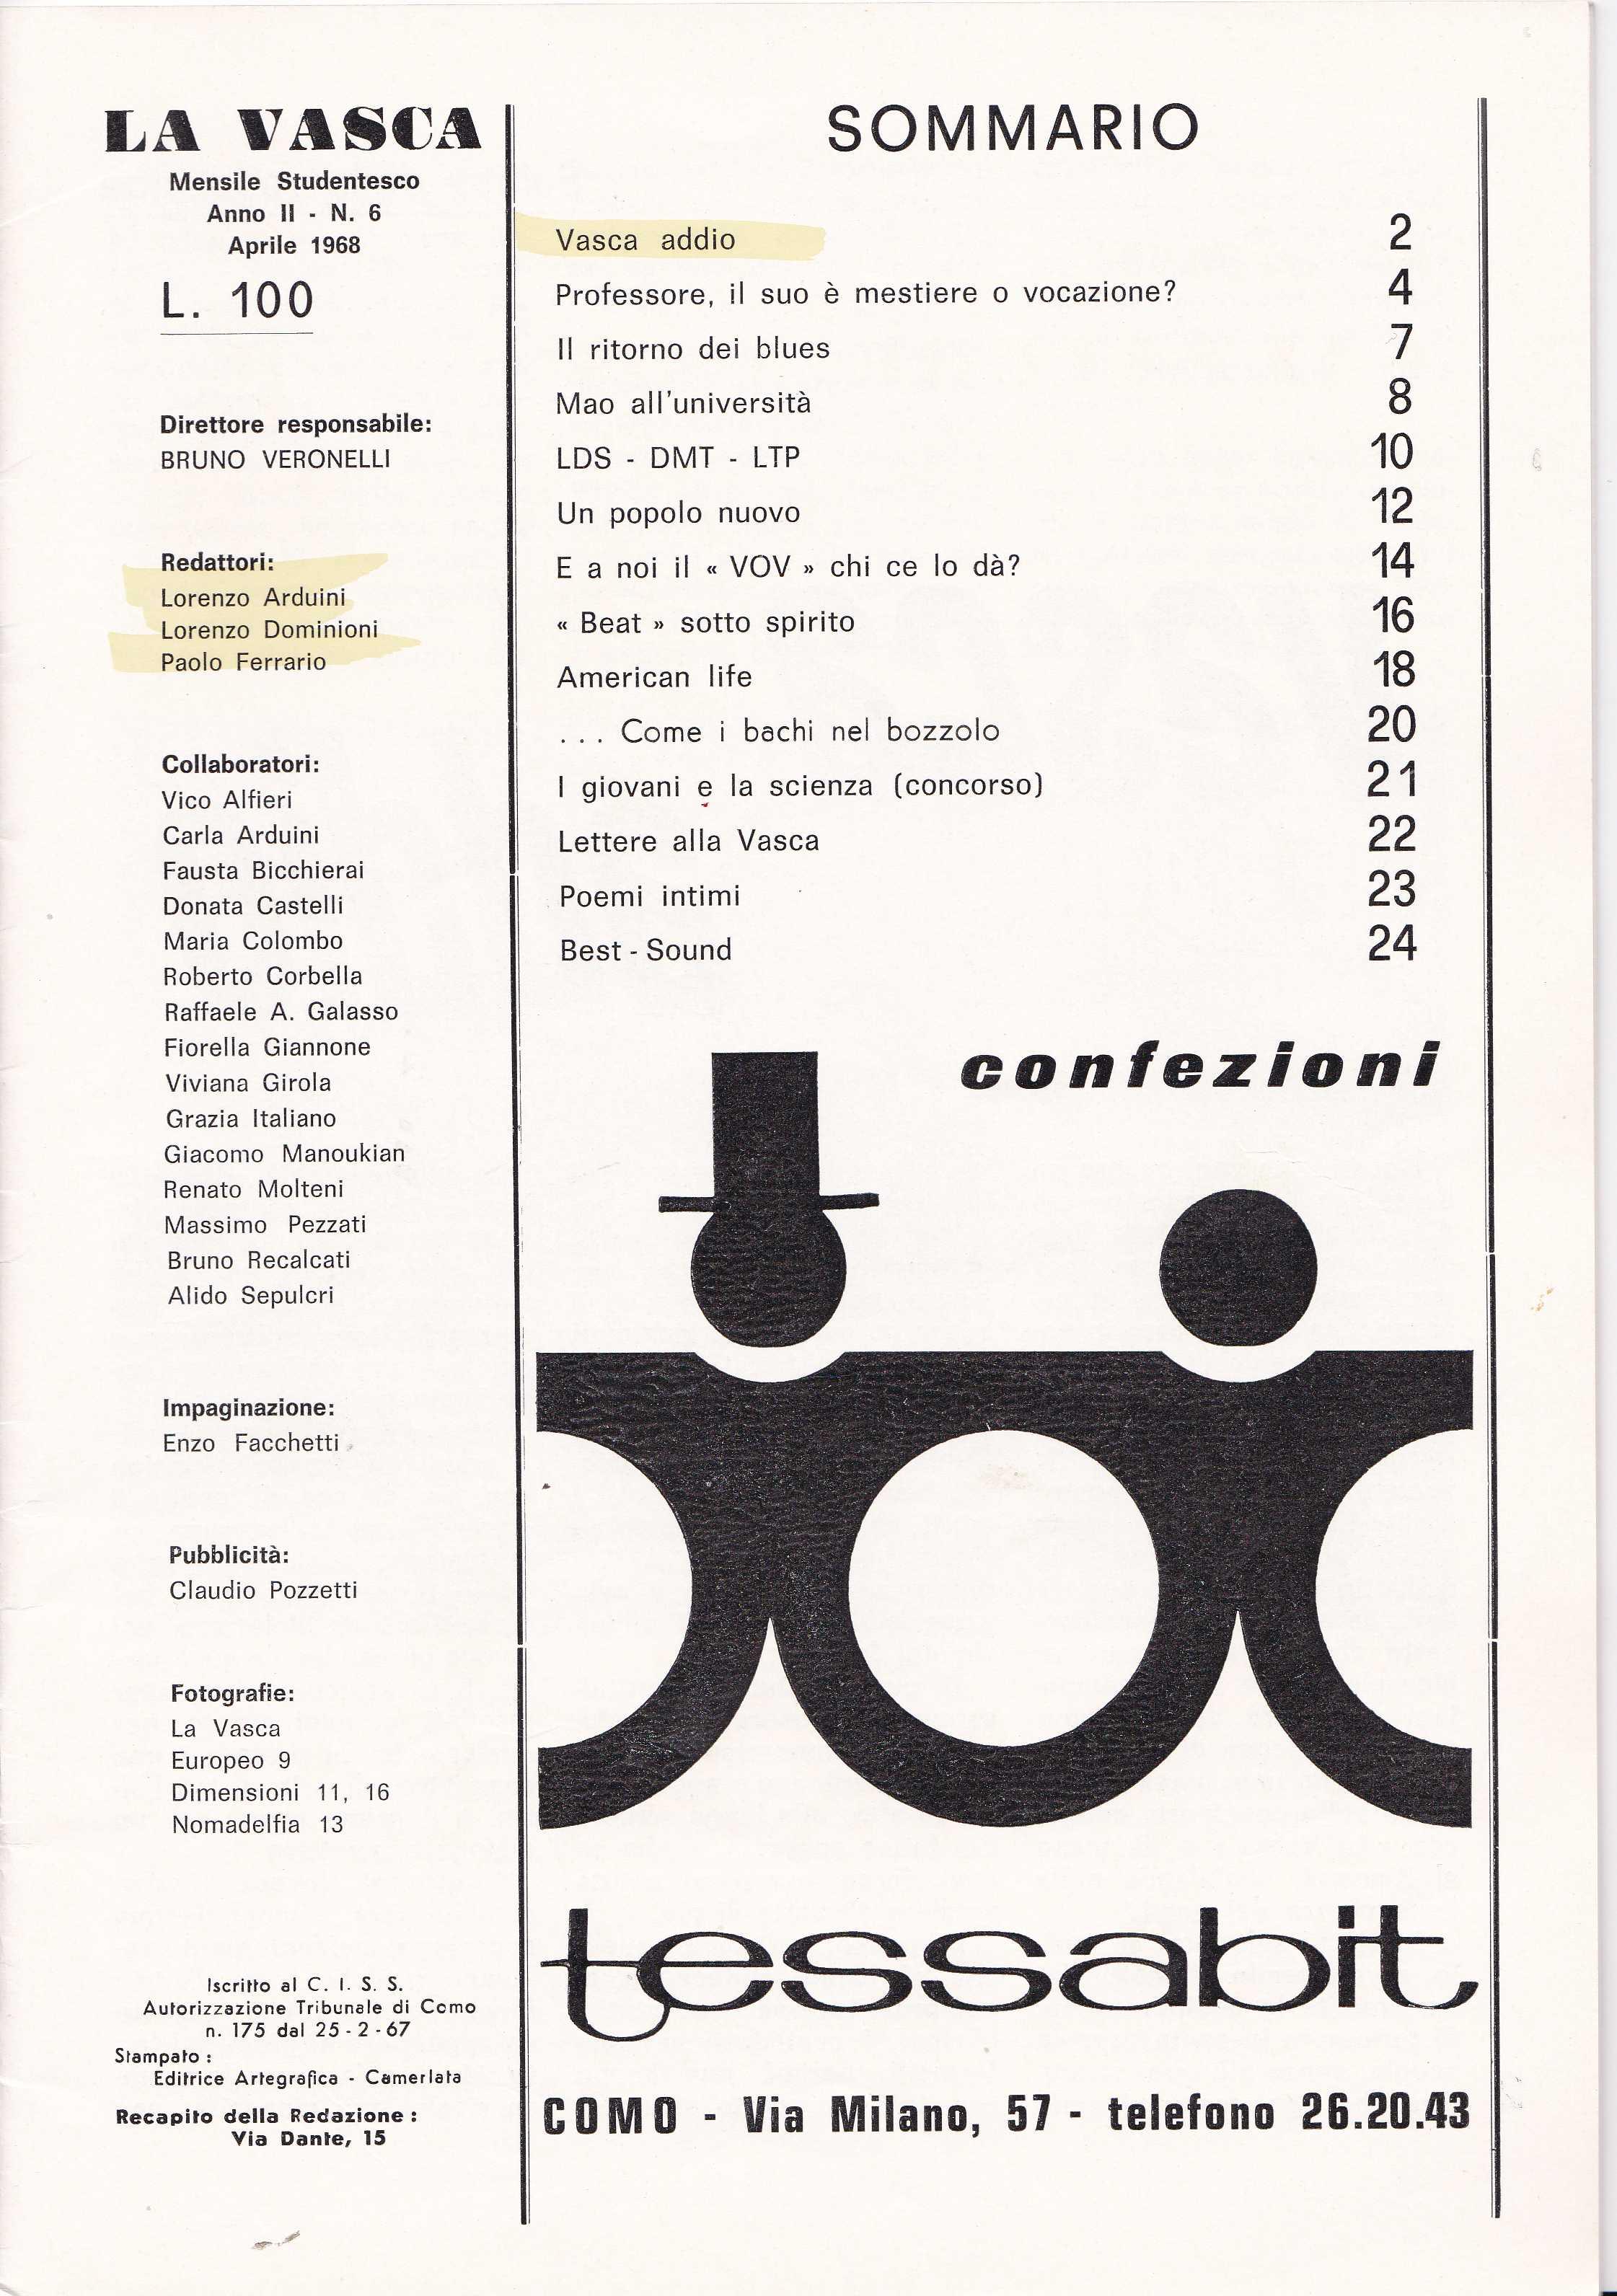 vasca 6 19683063